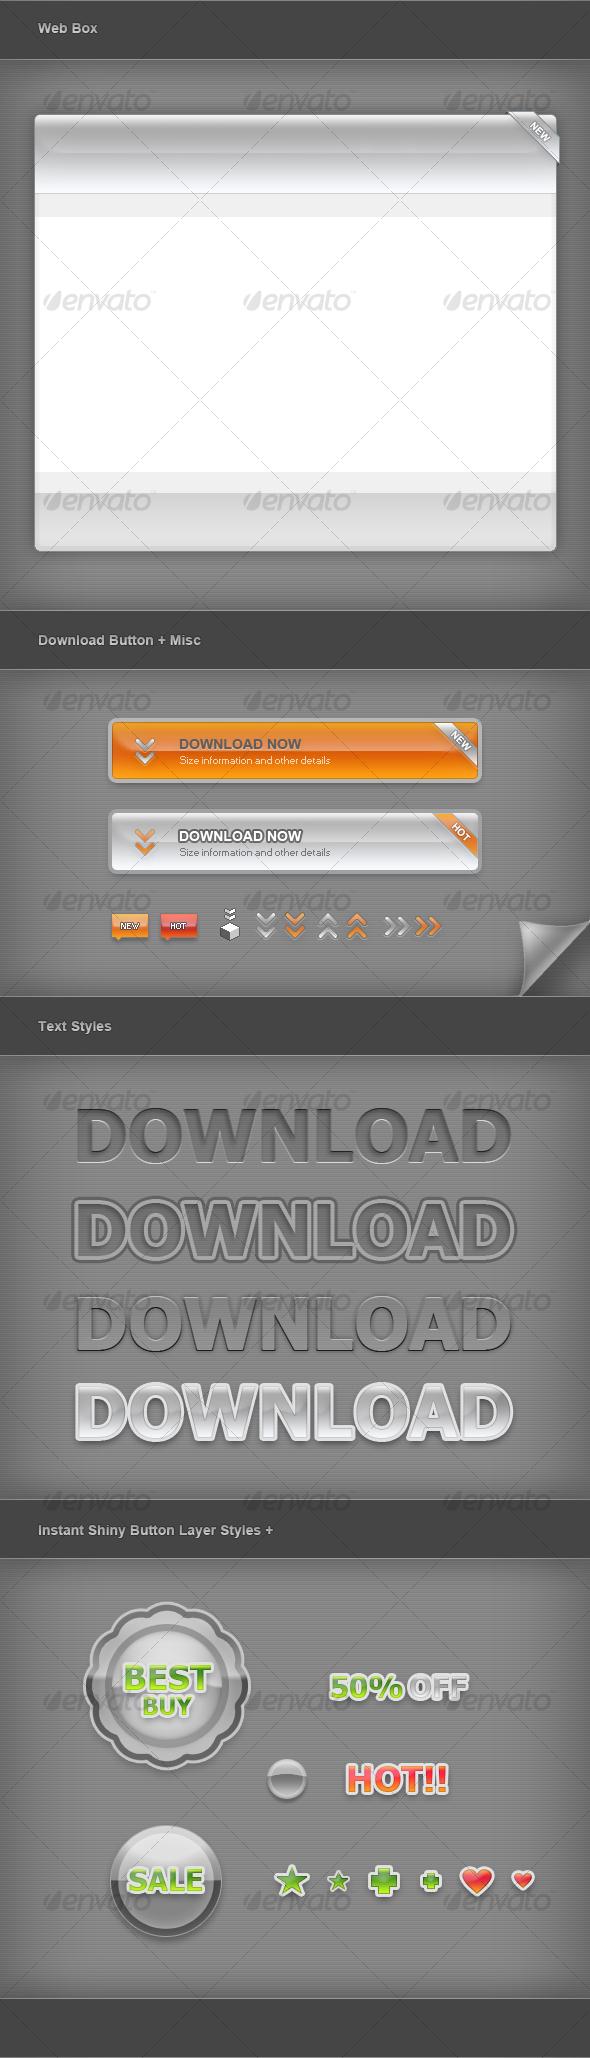 GraphicRiver Web Graphic Elements 01 103561